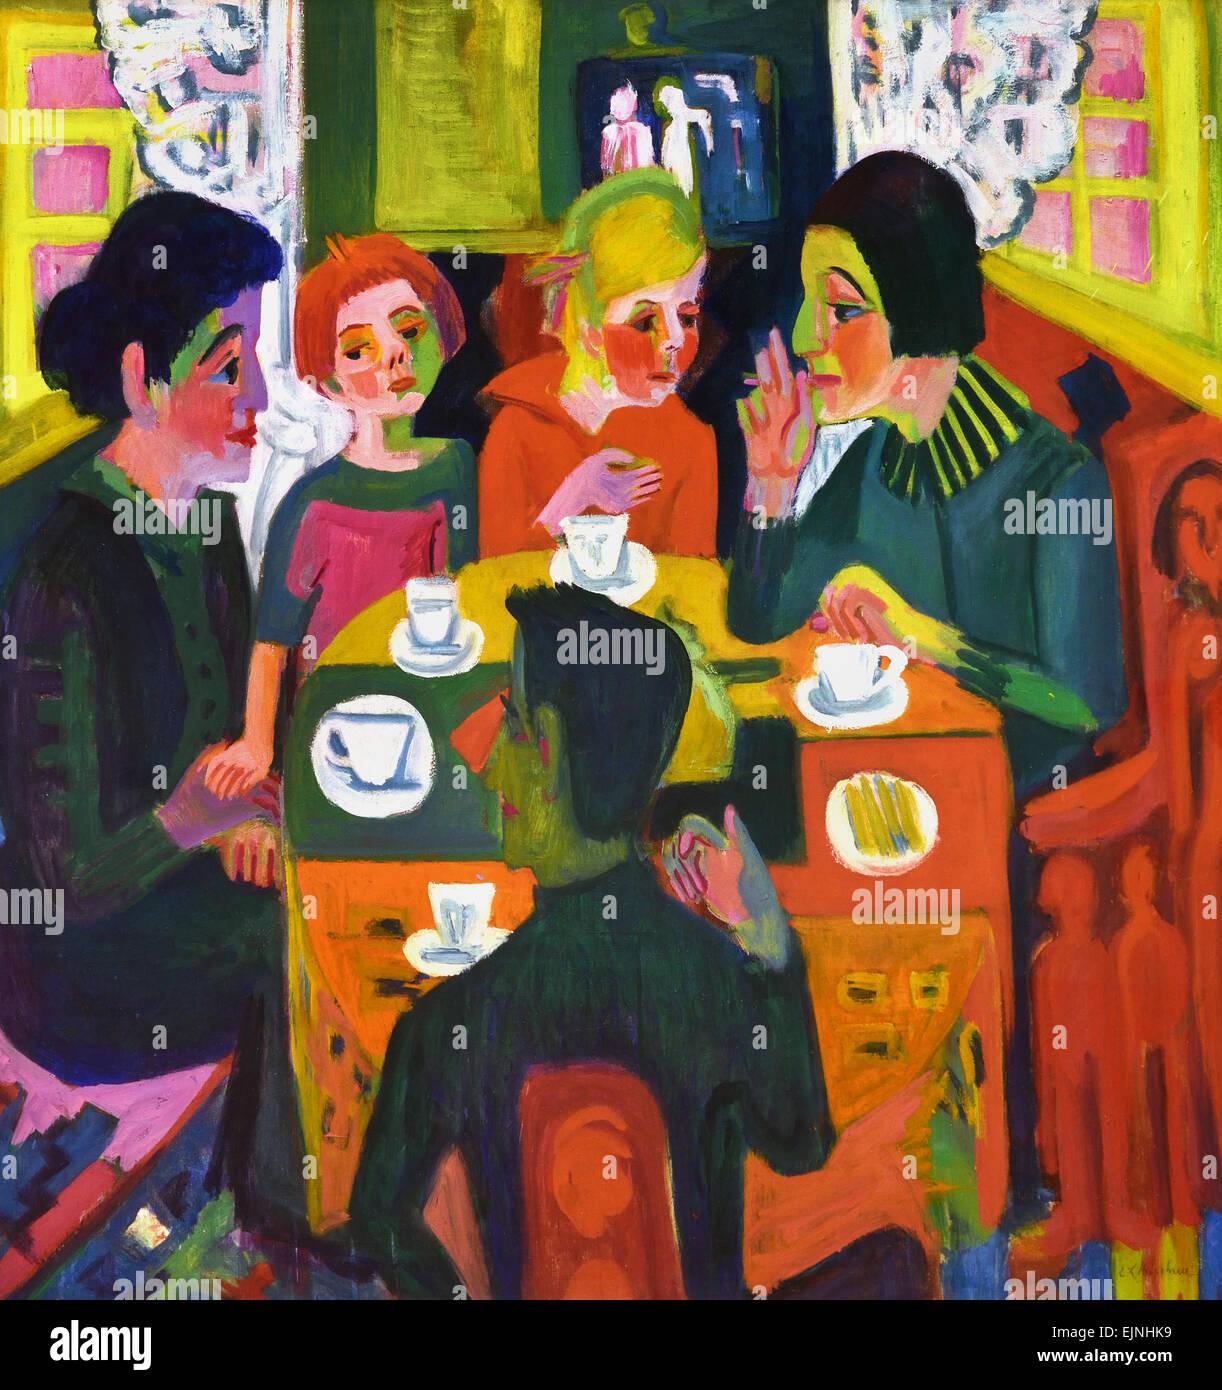 Mesa De Café 1923 Ernst Ludwig Kirchner 1880-1938 alemán Alemania Foto de stock